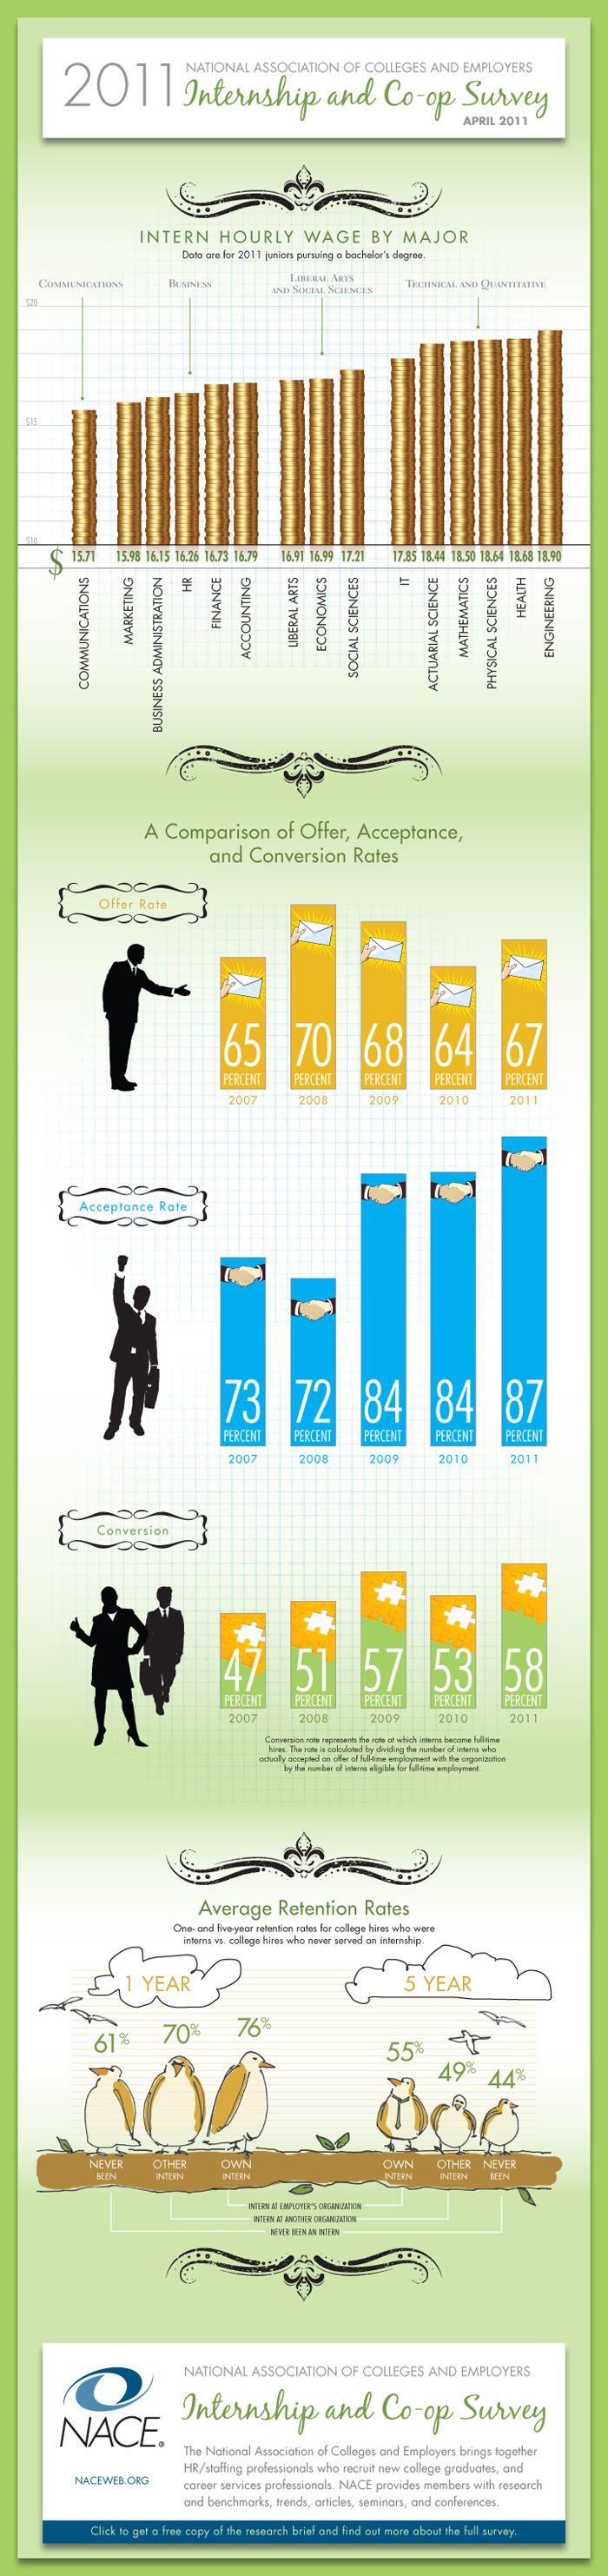 59 best Internships images on Pinterest | Career advice, College ...